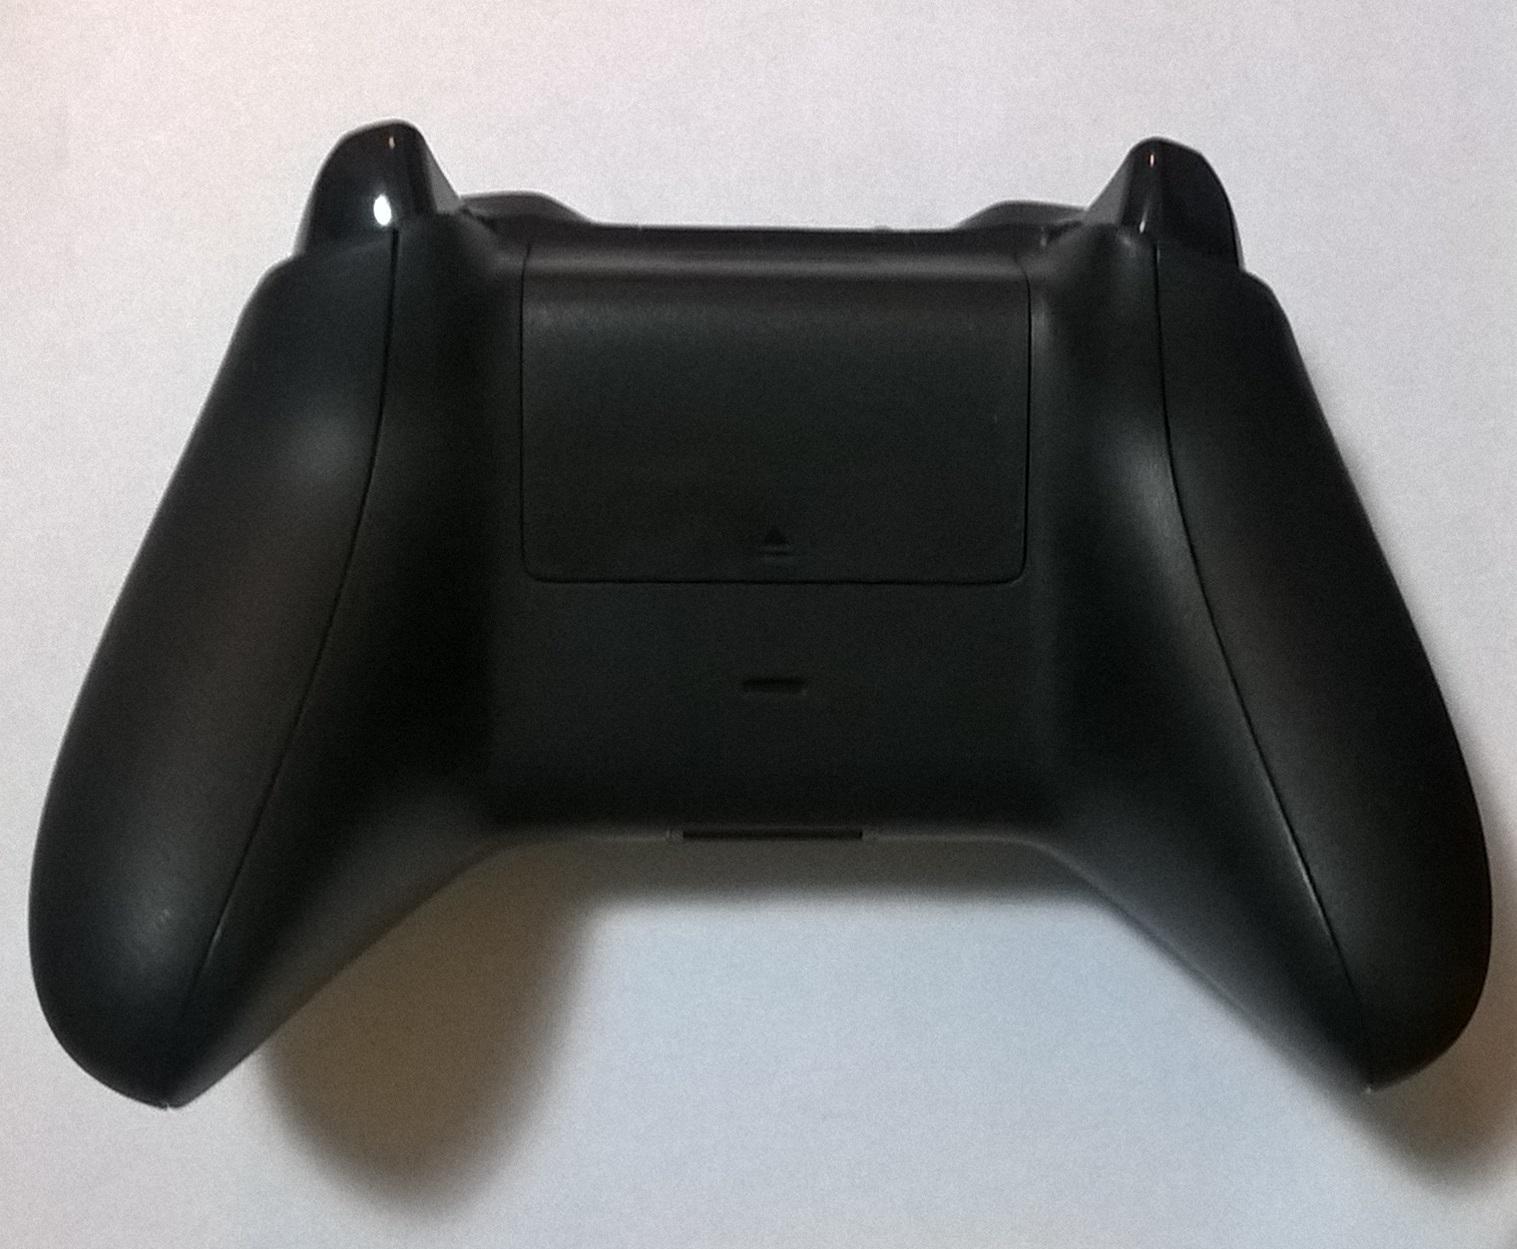 High Quality WIIU Handle Slim Gamepad Double Joypad For Xbox WIIU Console 10